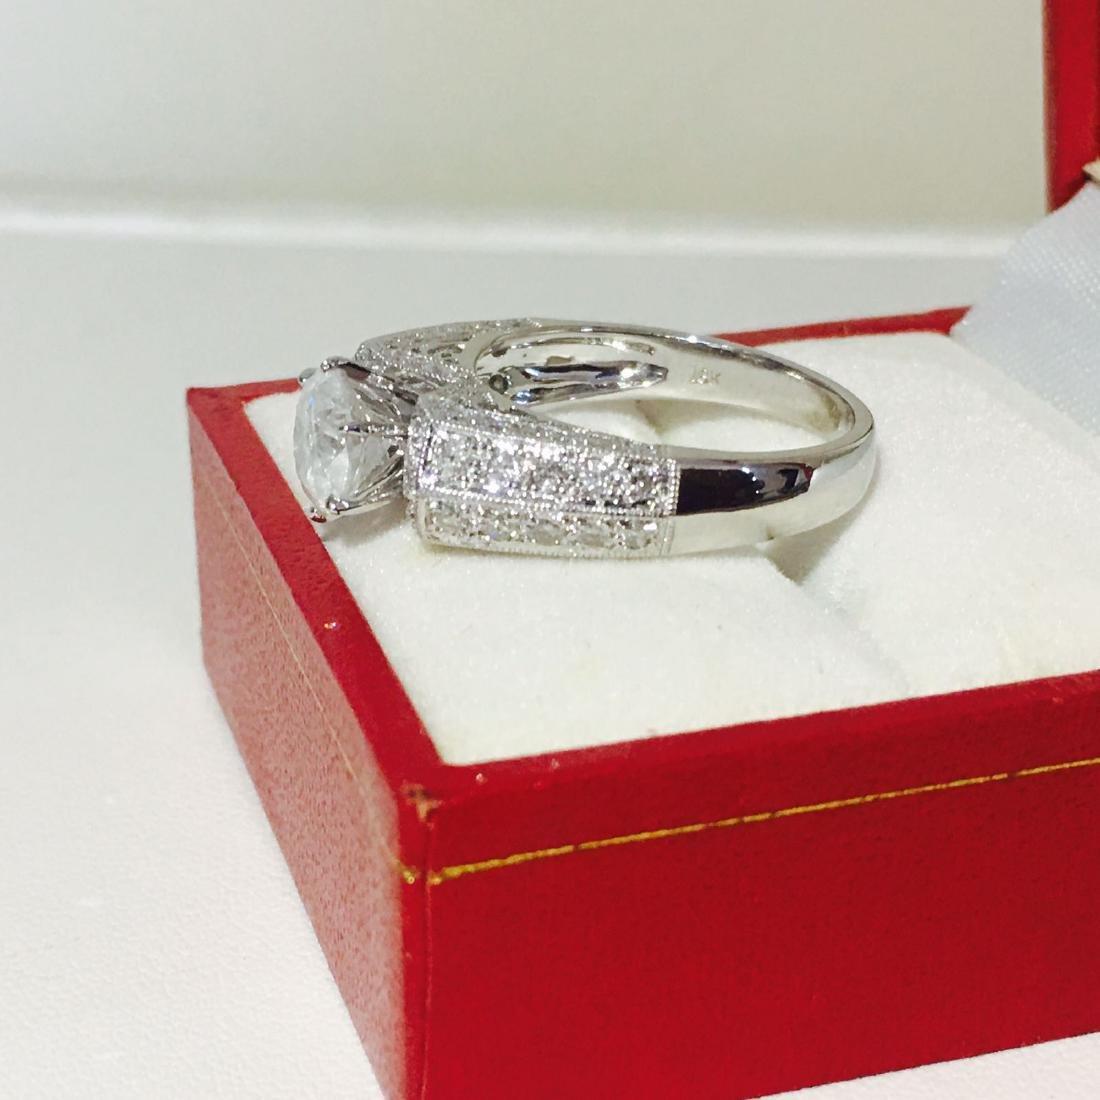 18K White Gold, 2.10 CT Diamond Engagement Ring - 7